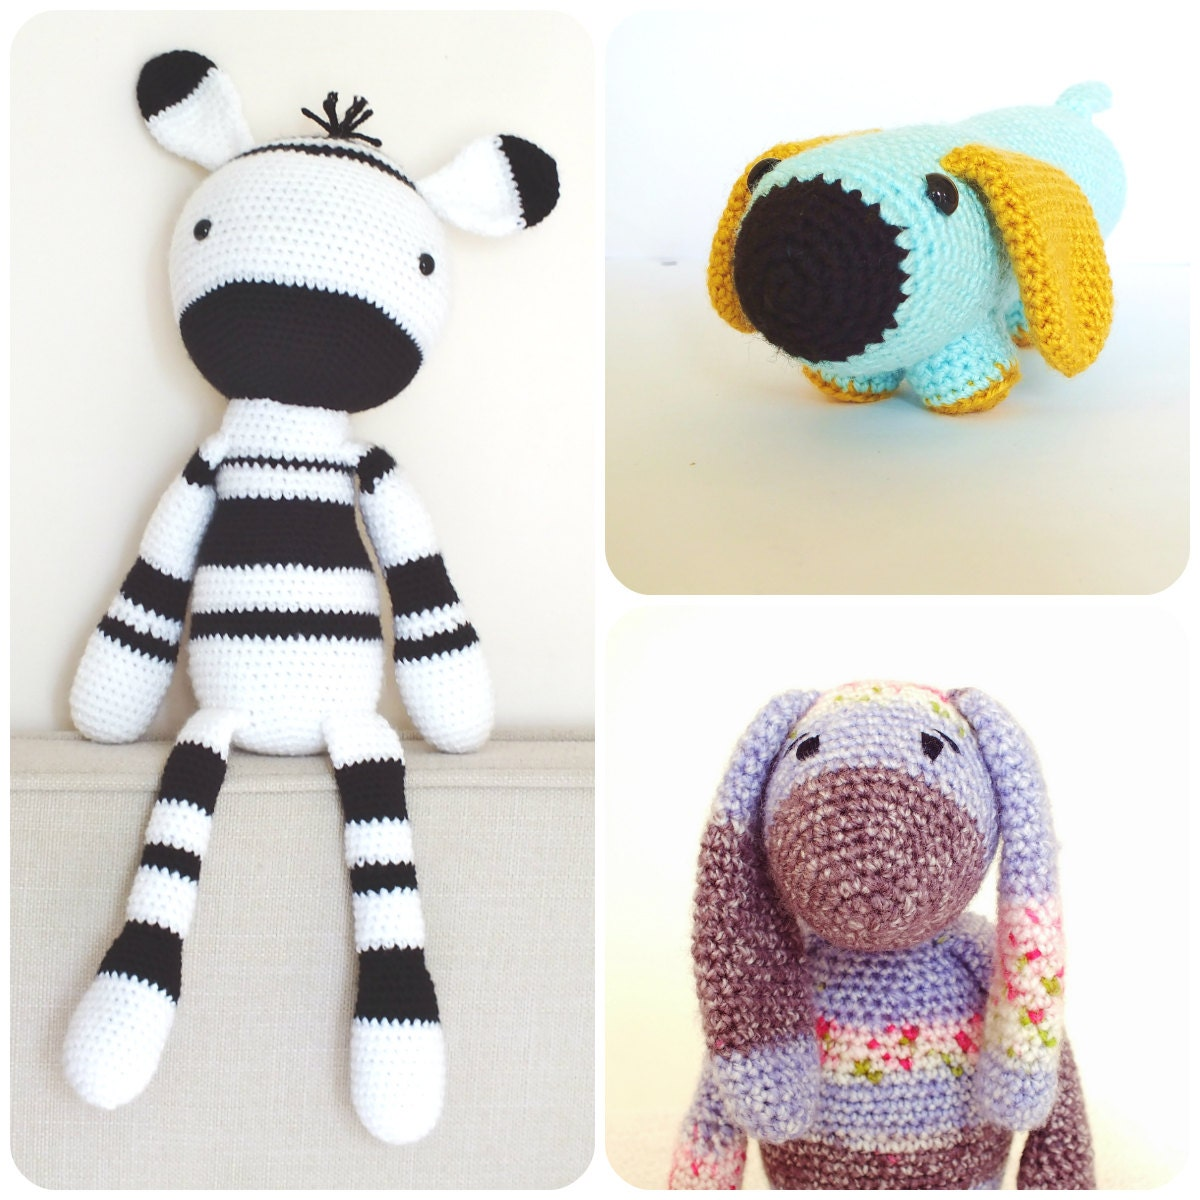 Amigurumi Yarn Pack : Crochet Amigurumi PATTERNS Pack Special Offer by KornflakeStew